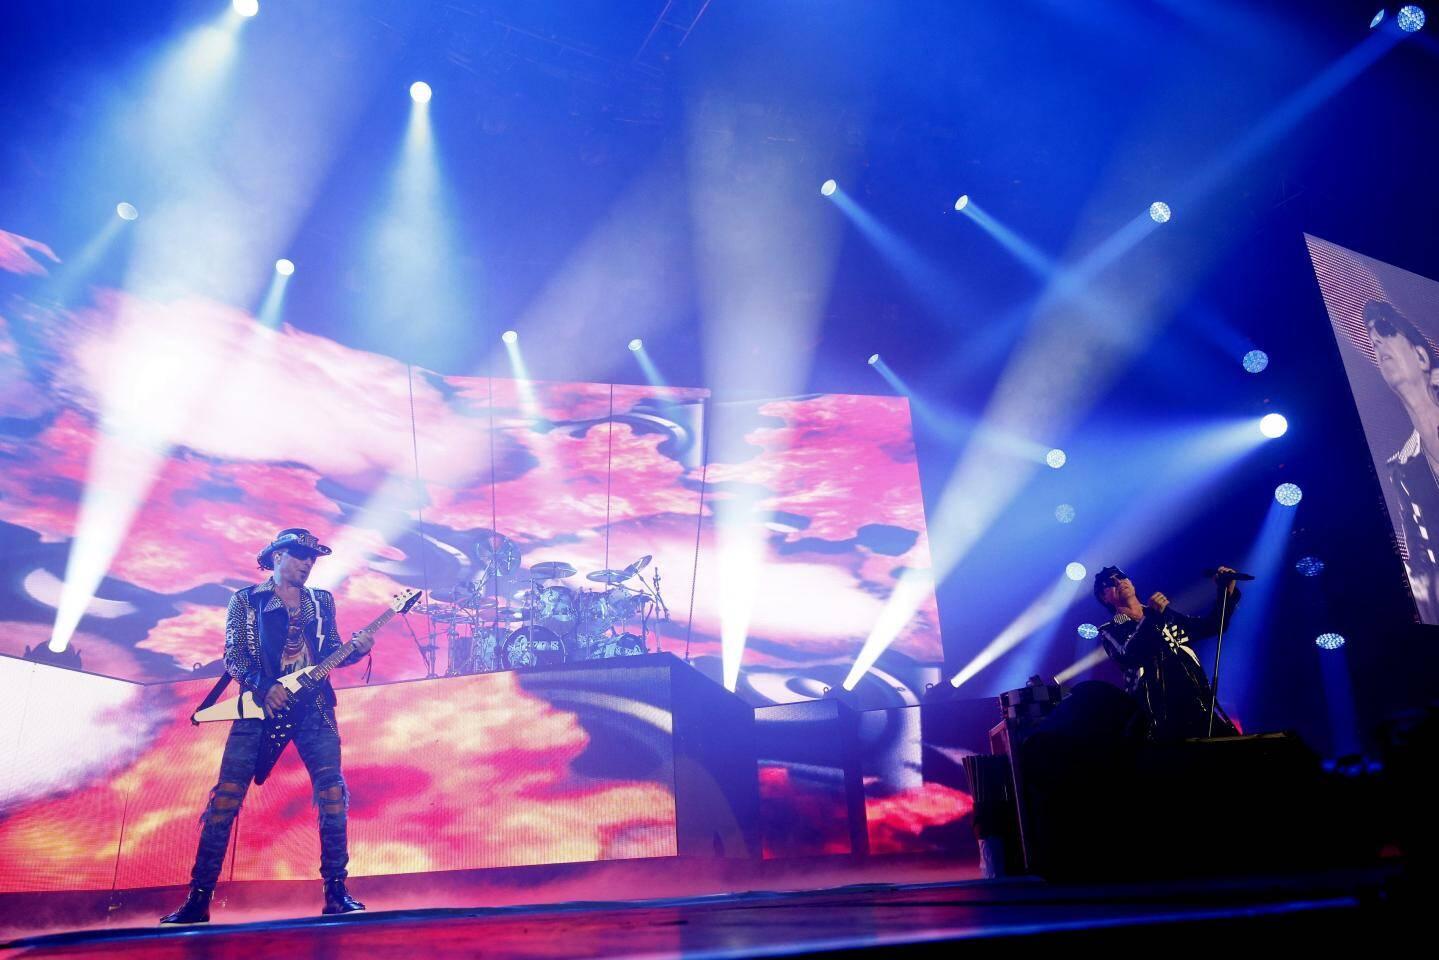 Le groupe Scorpions au Zénith de Toulon ce mercredi.